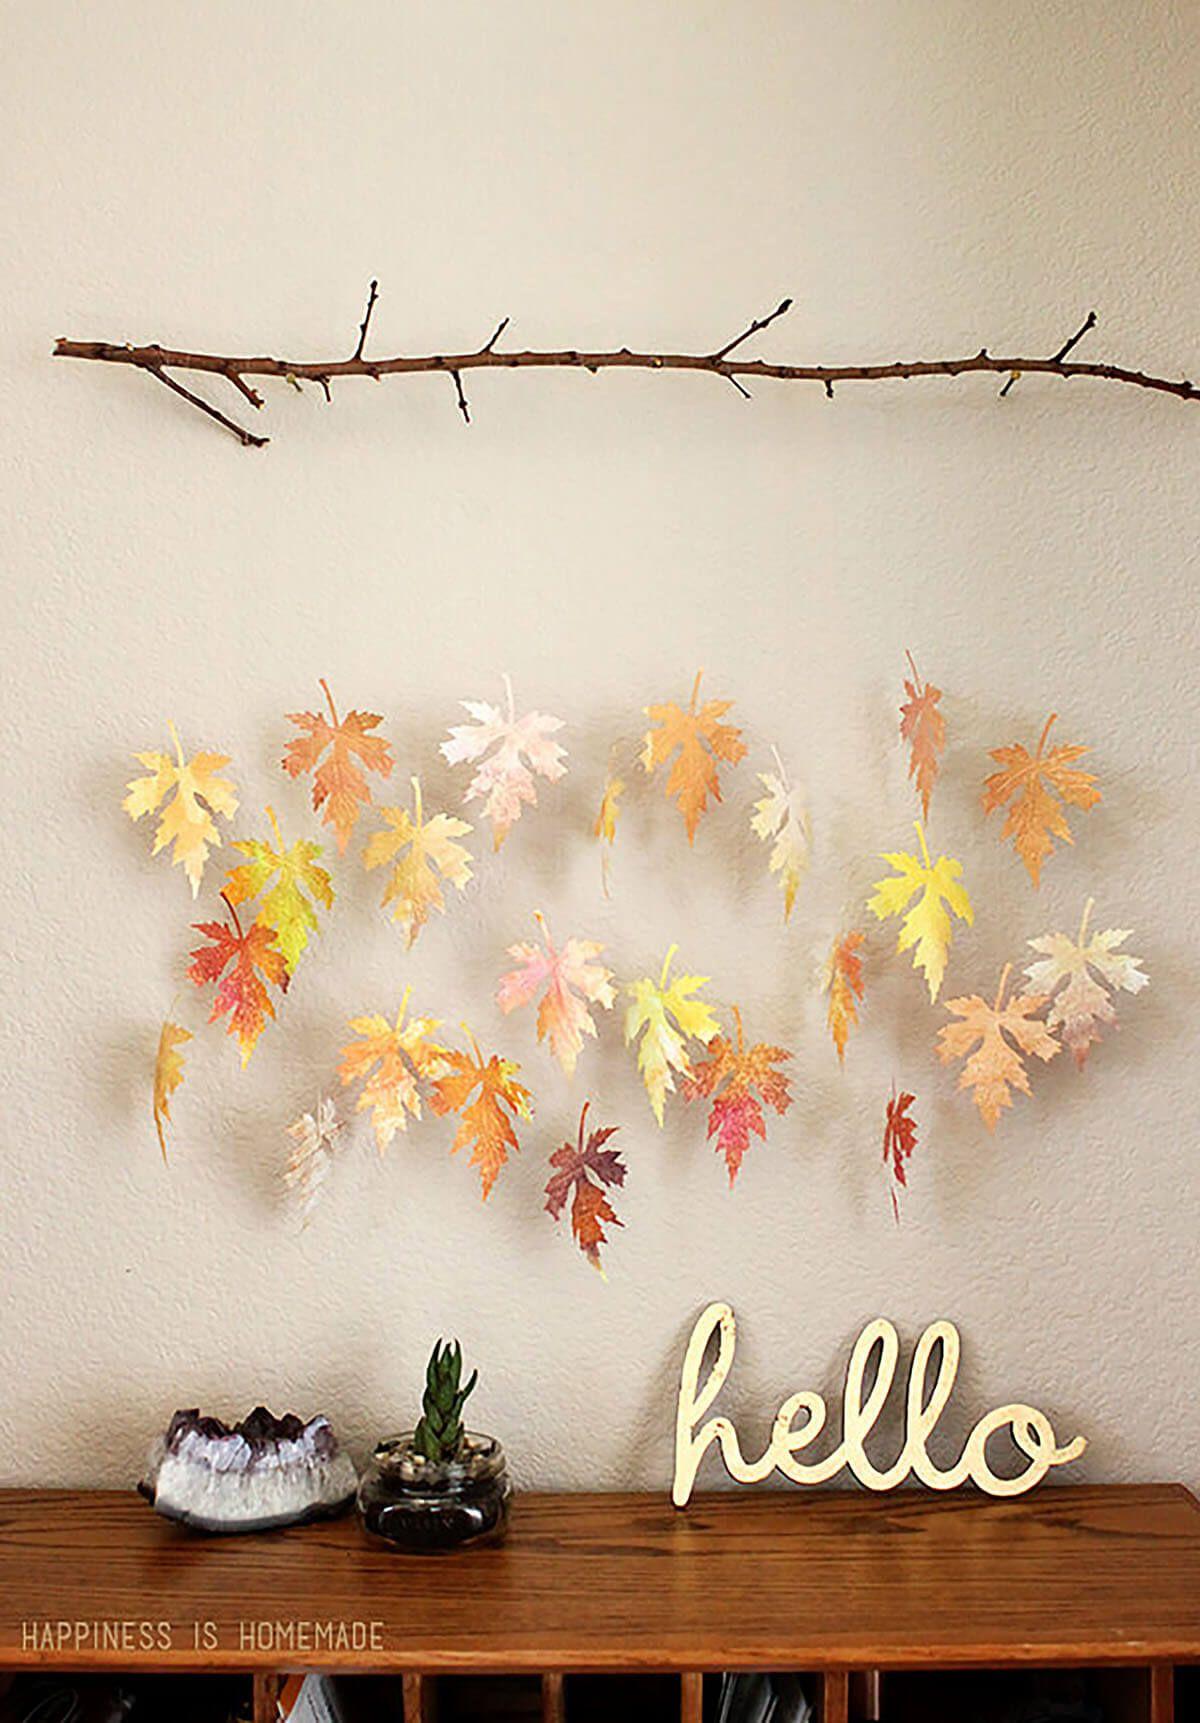 26 Colorful Diy Fall Leaf Crafts You Must Try This Season Thanksgiving Decorations Diy Fall Diy Diy Fall